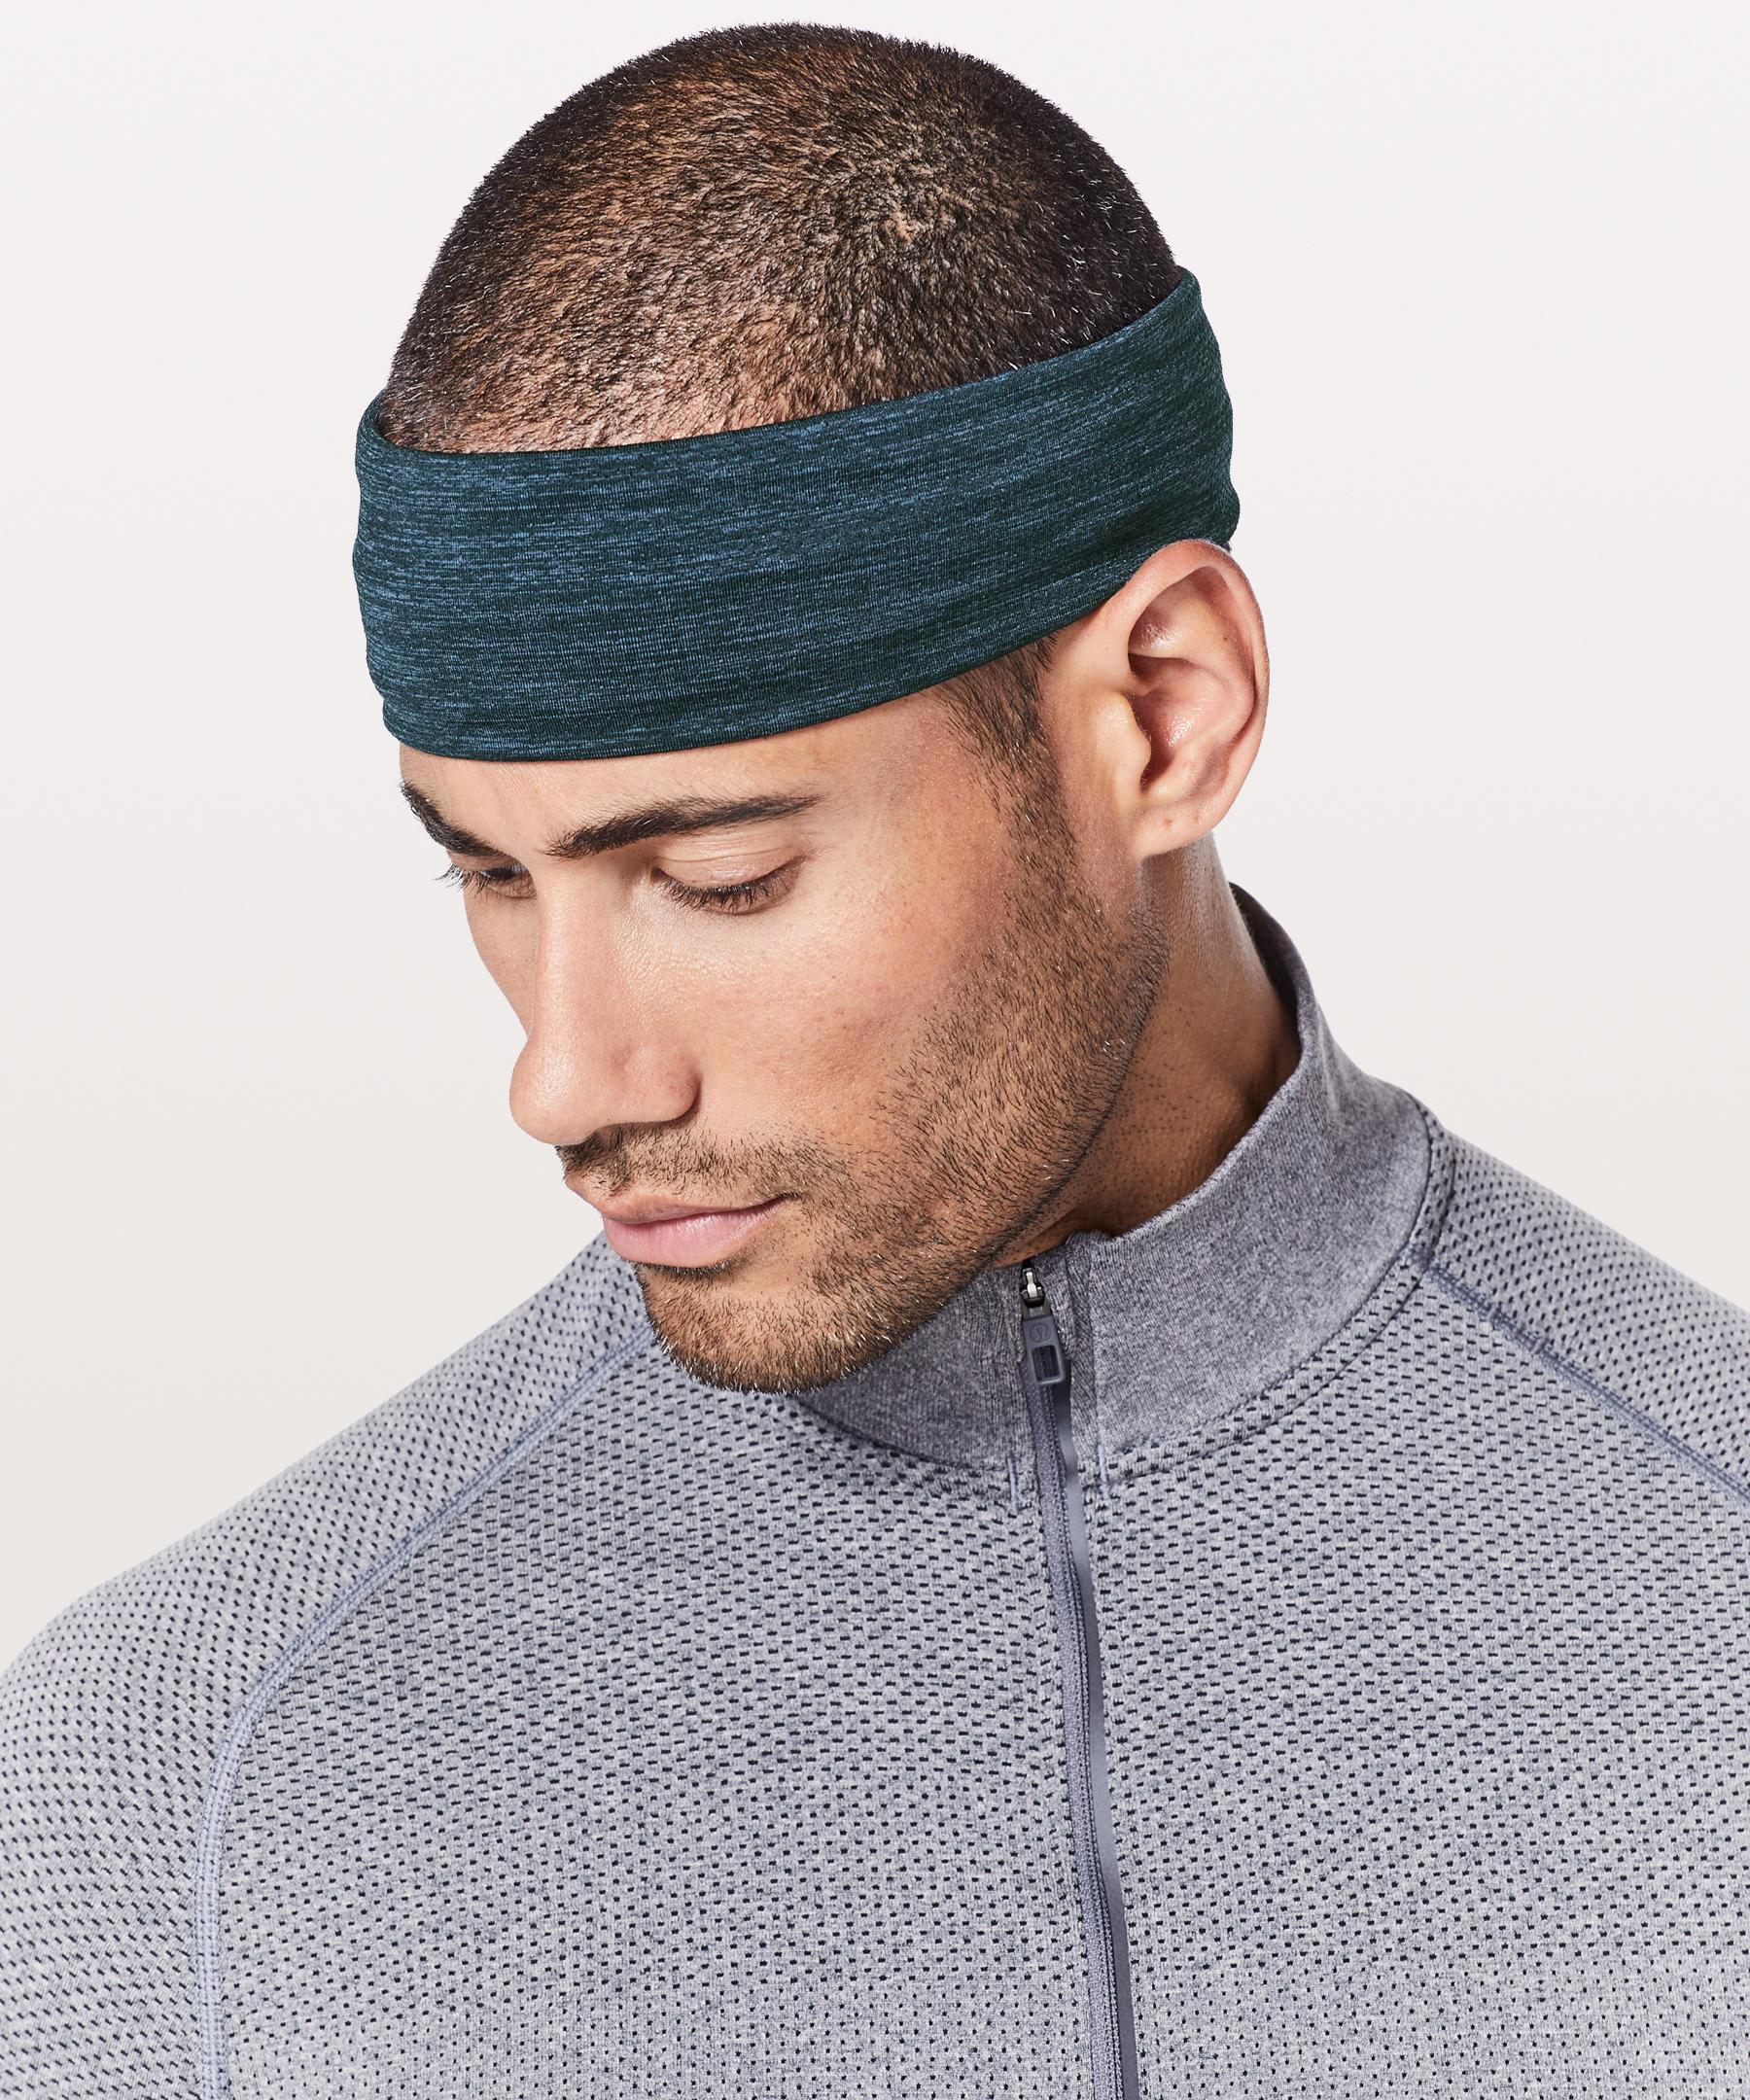 7ba289507ff7b Lululemon Athletica Metal Vent Tech Headband in Blue for Men - Lyst